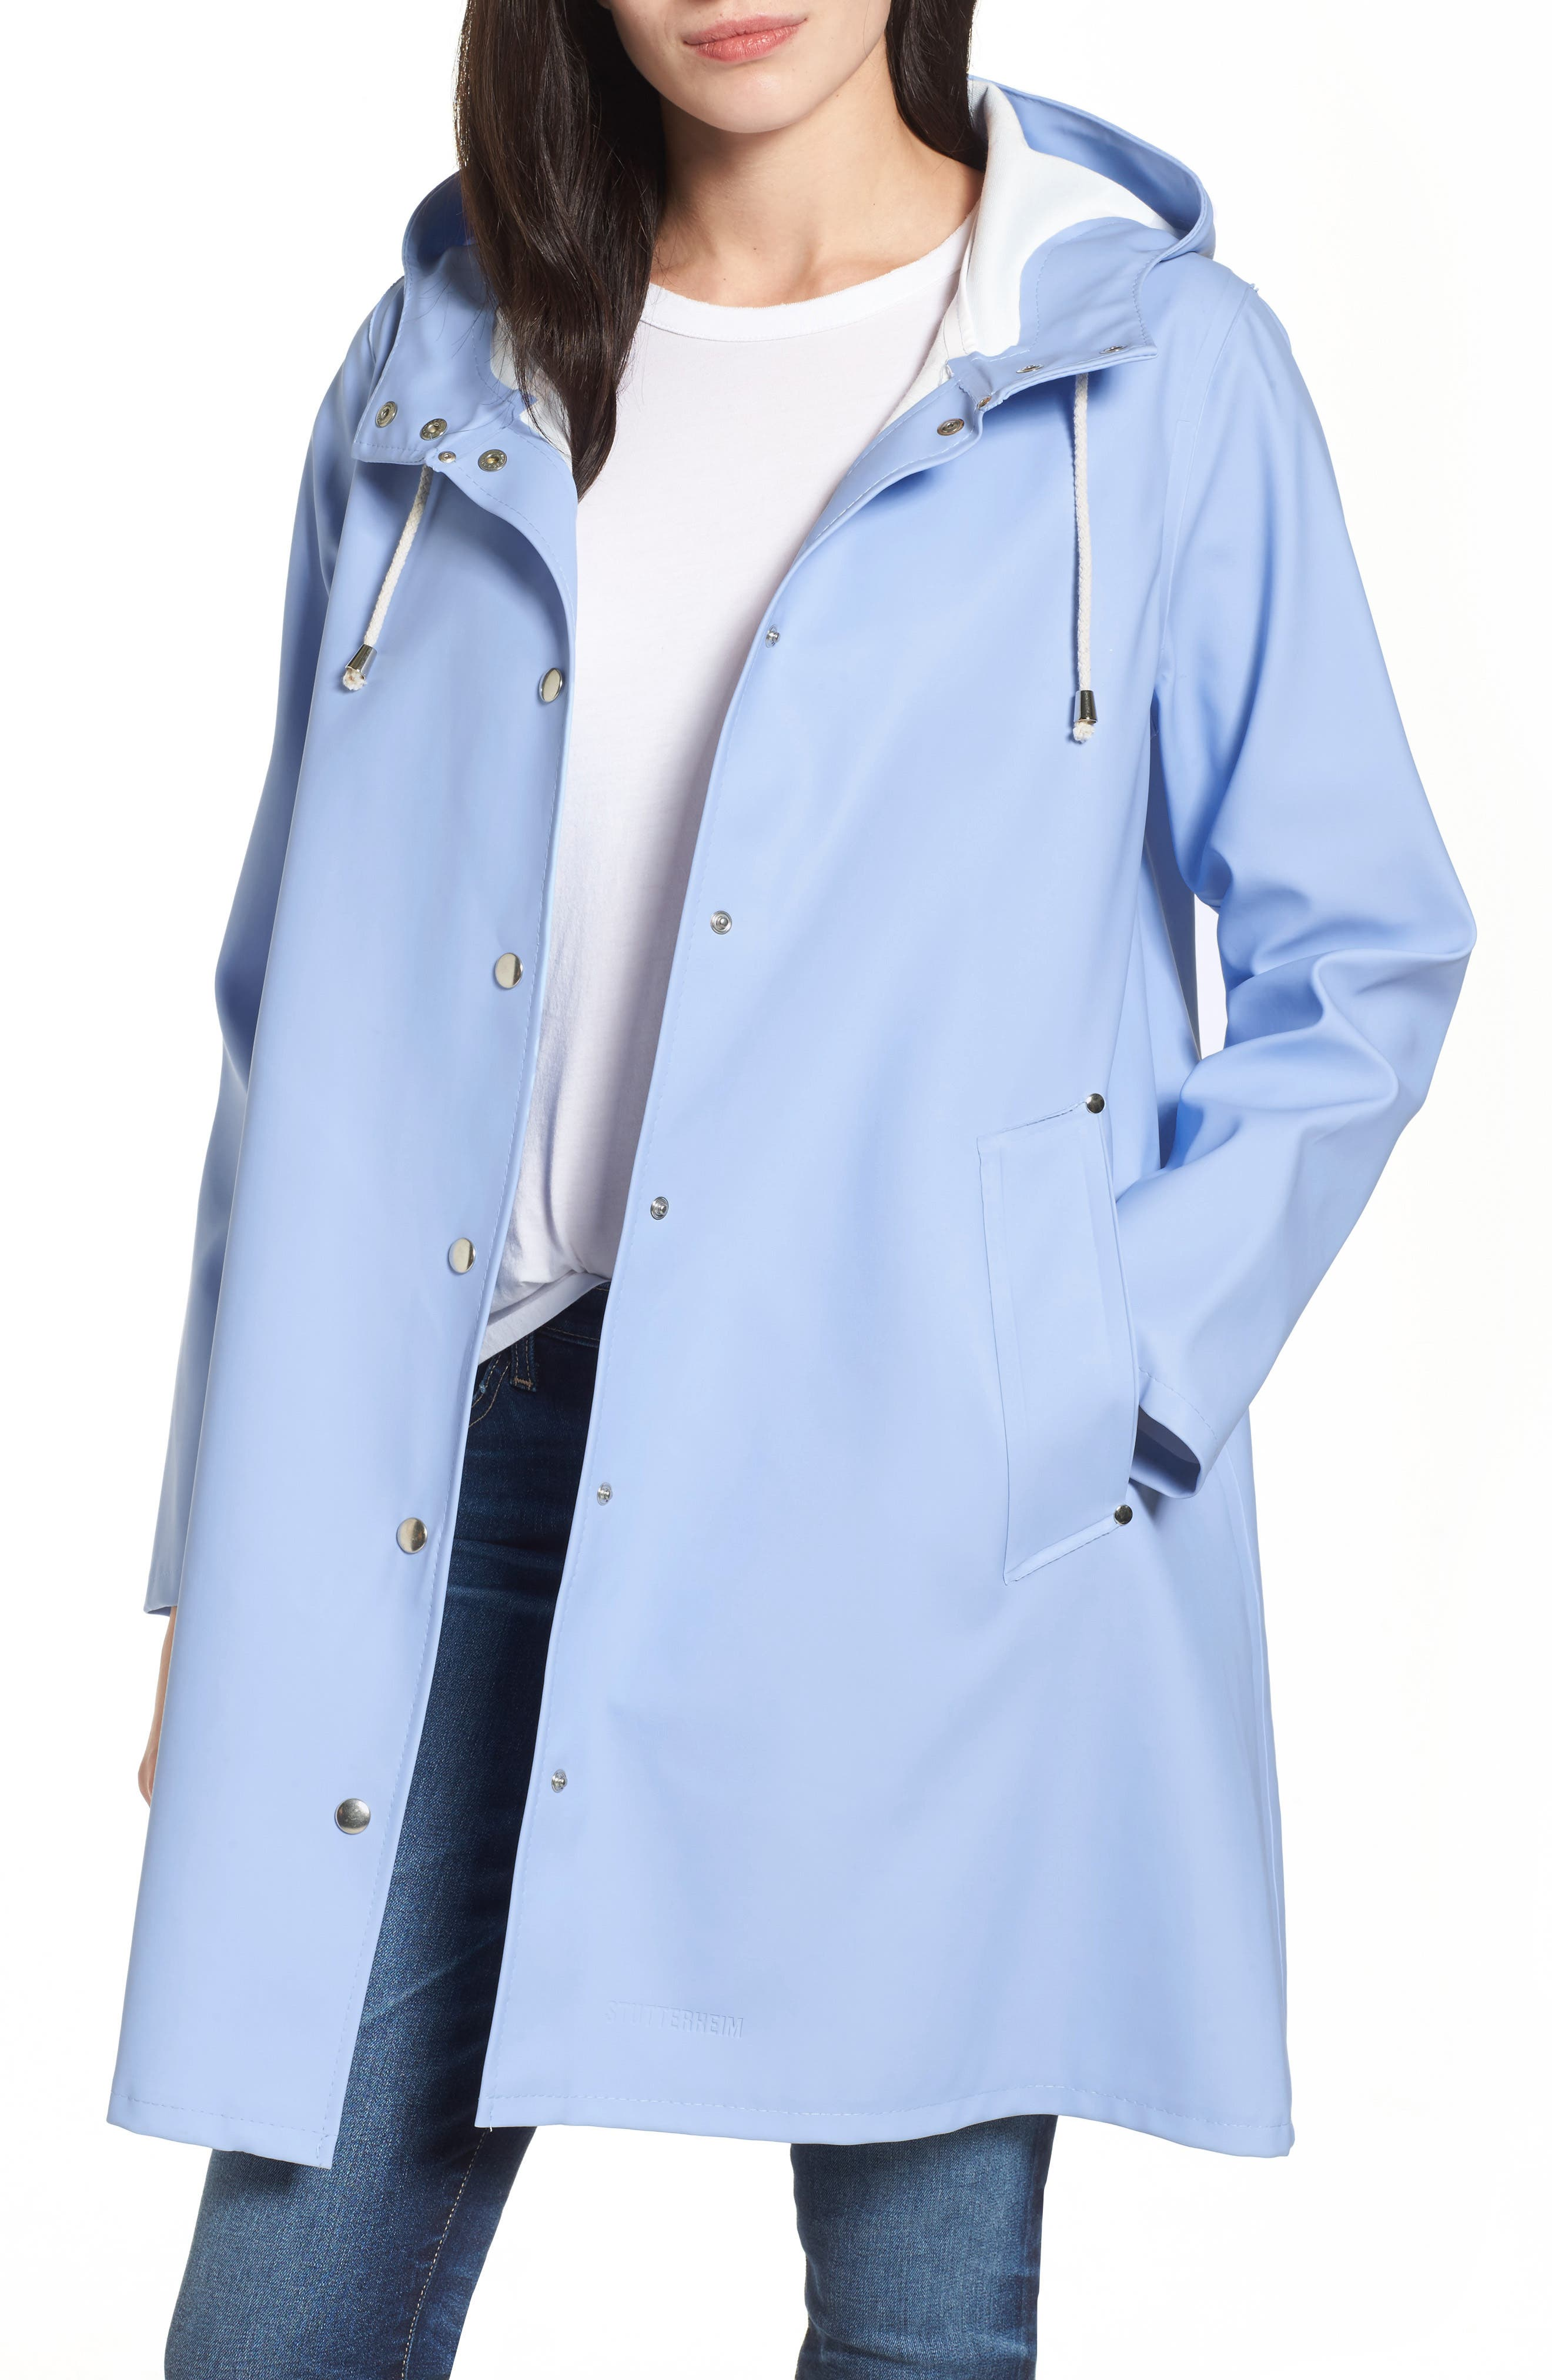 Main Image - Stutterheim Mosebacke Waterproof A-Line Hooded Raincoat